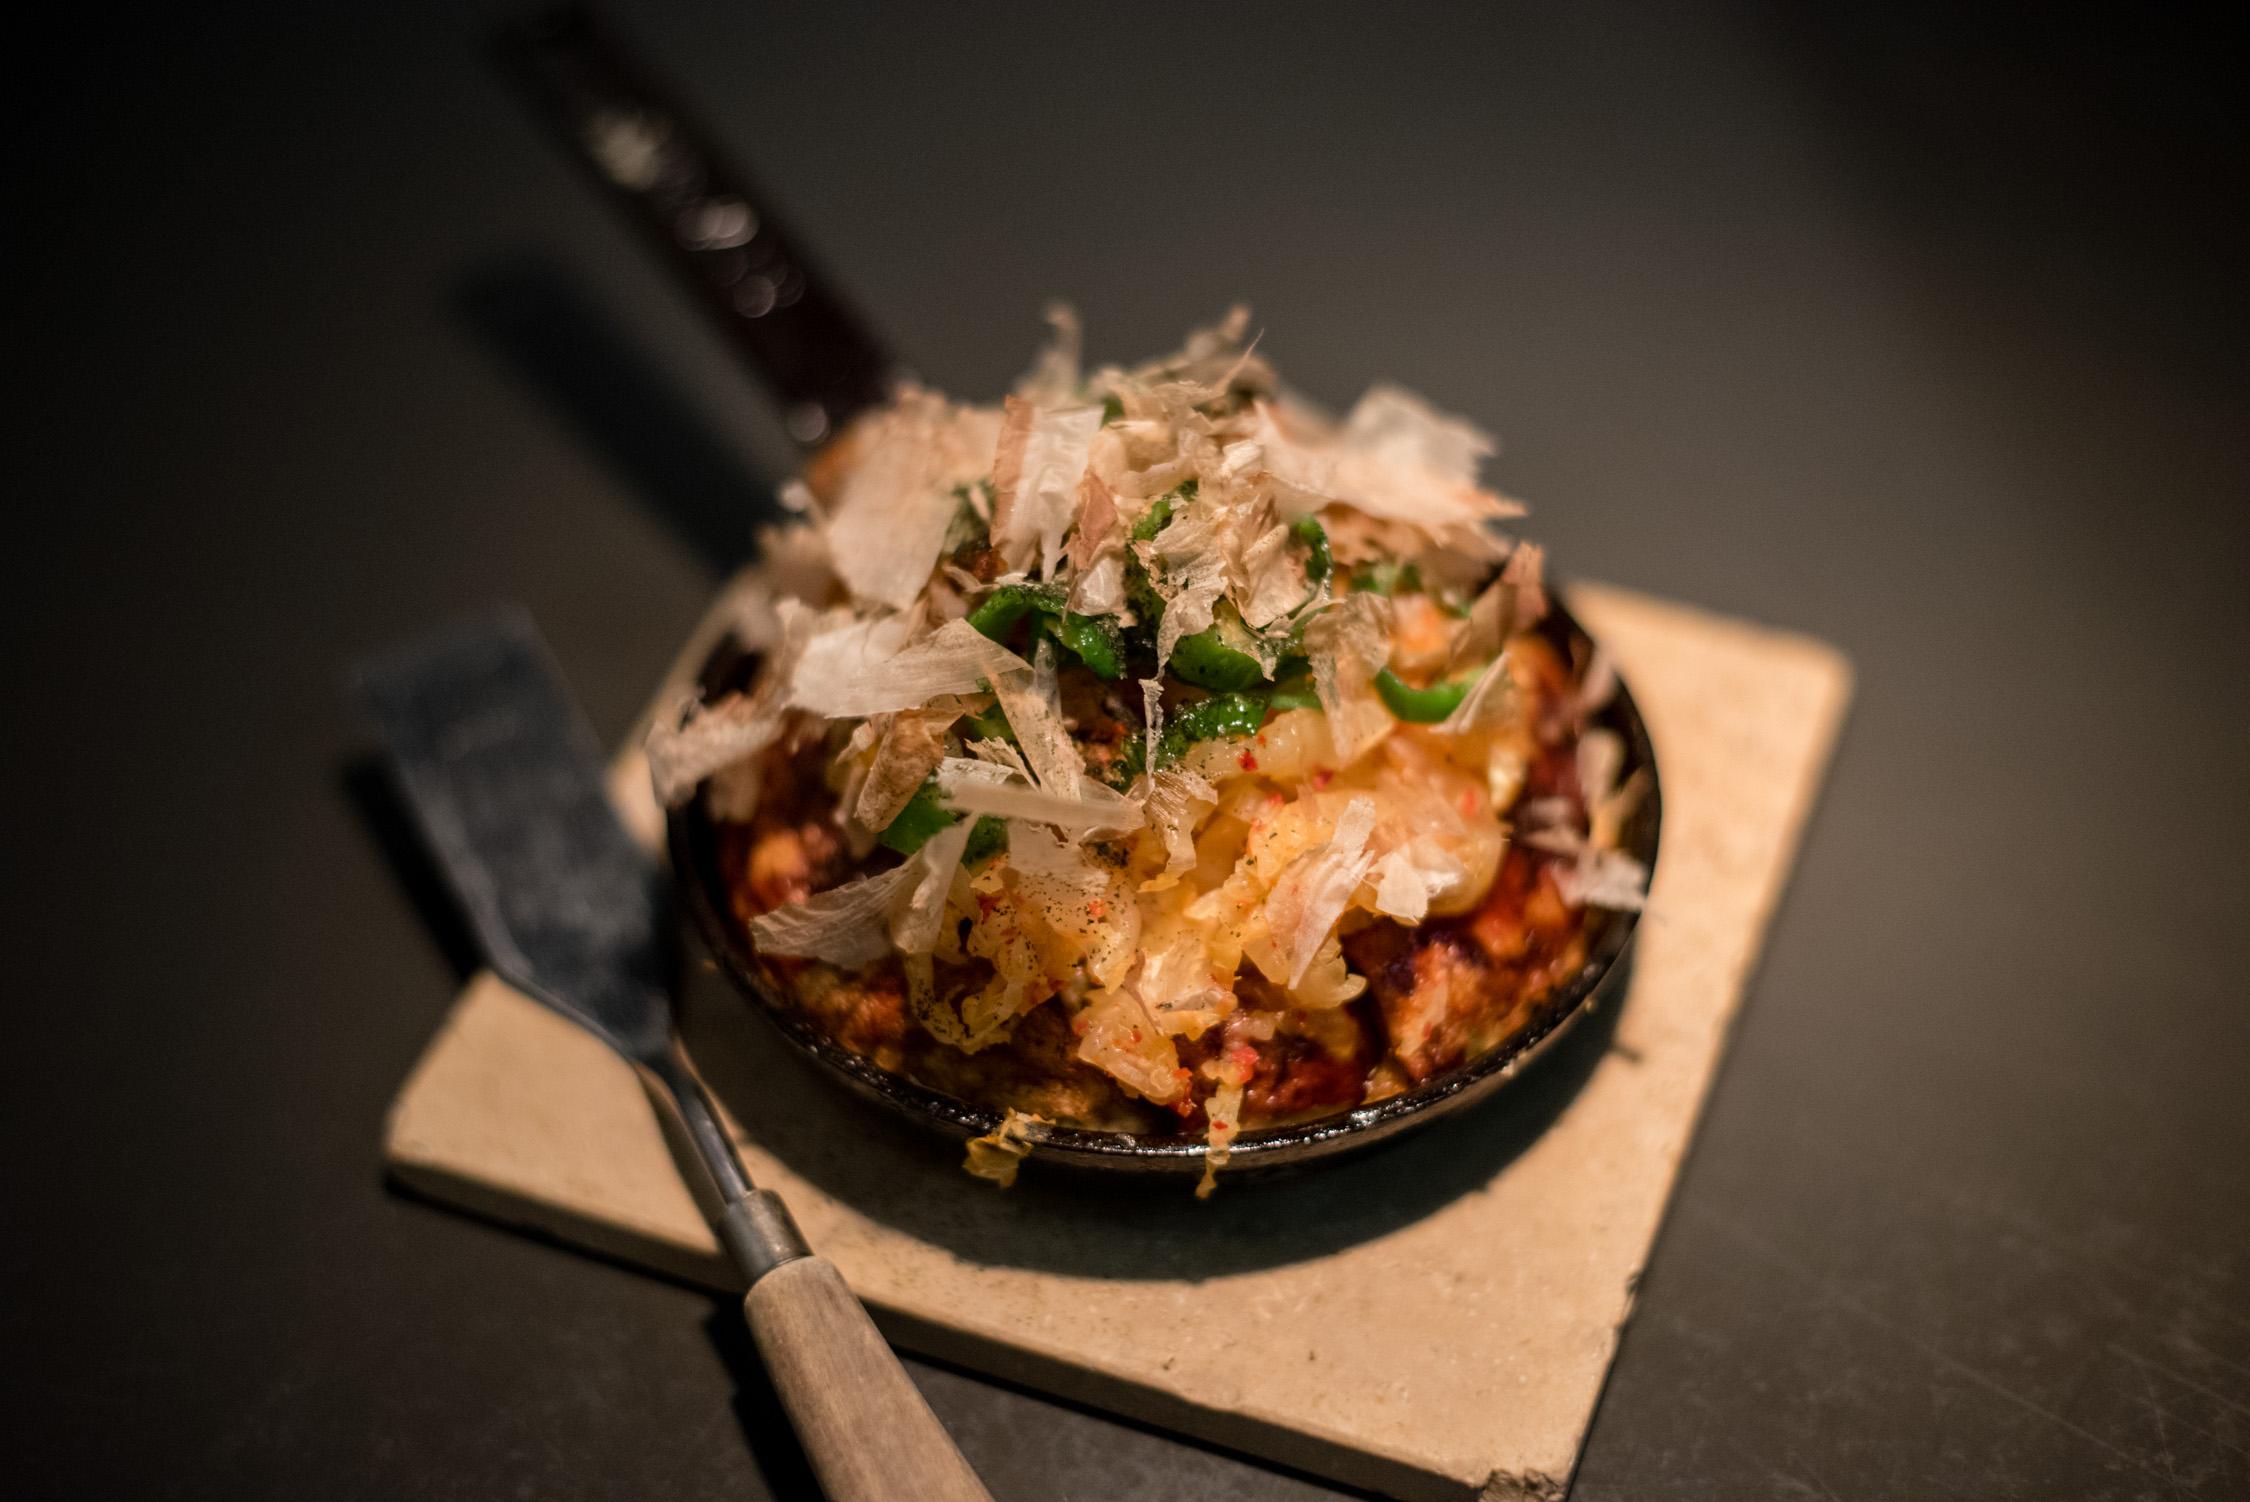 Okonomiyaki; A savory pancake loaded with all sorts of toppings